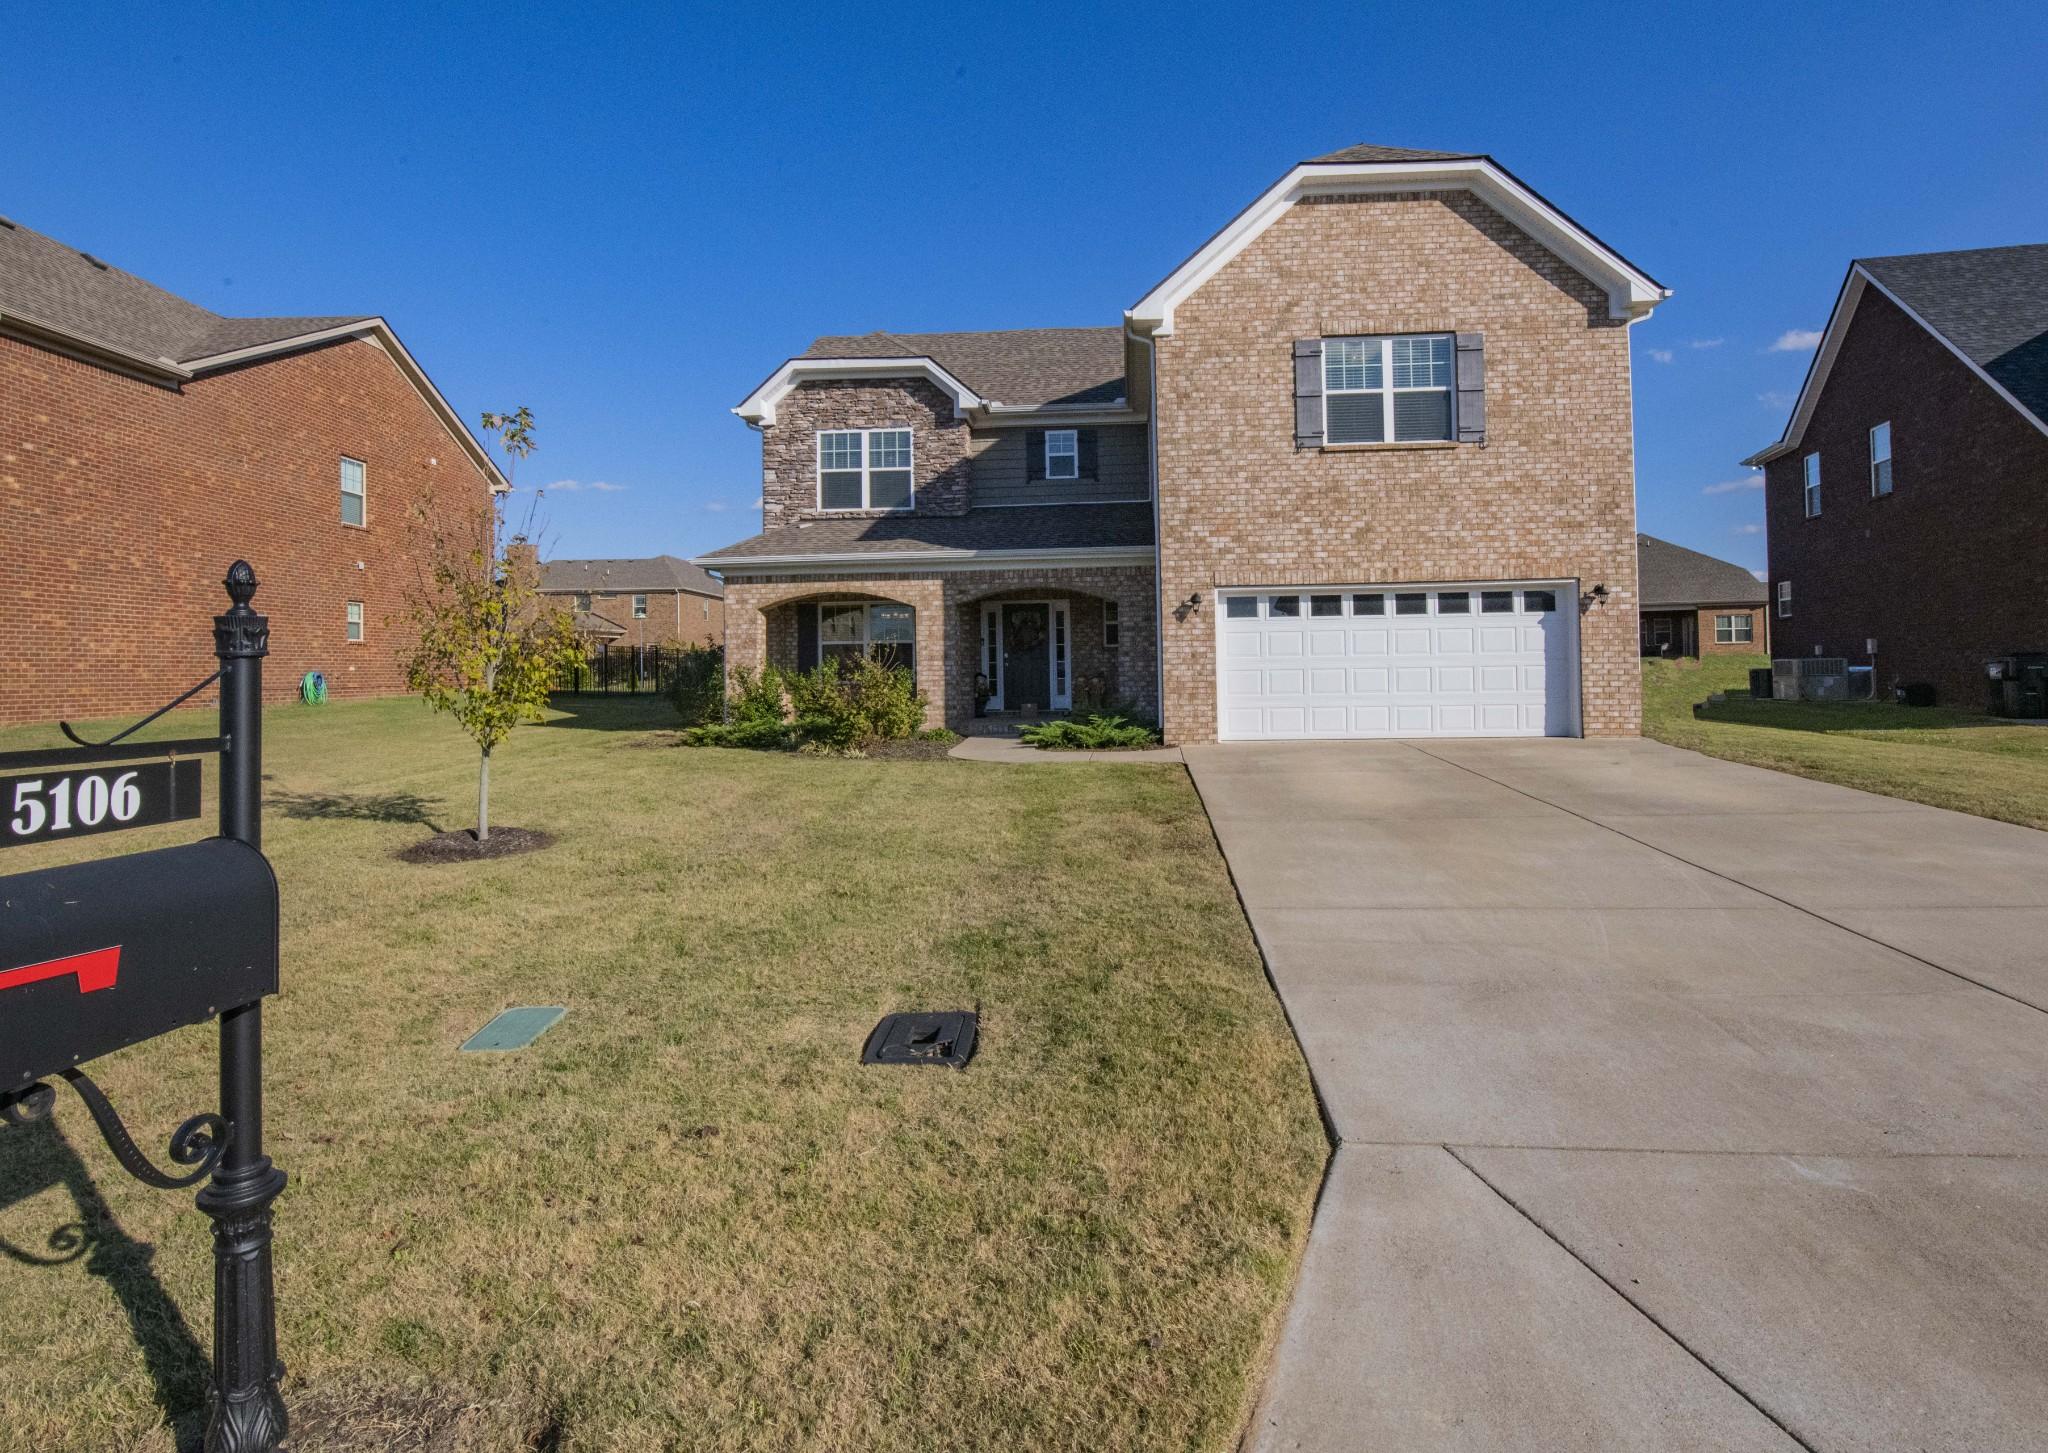 5106 Lady Thatcher Dr, Murfreesboro, TN 37129 - Murfreesboro, TN real estate listing